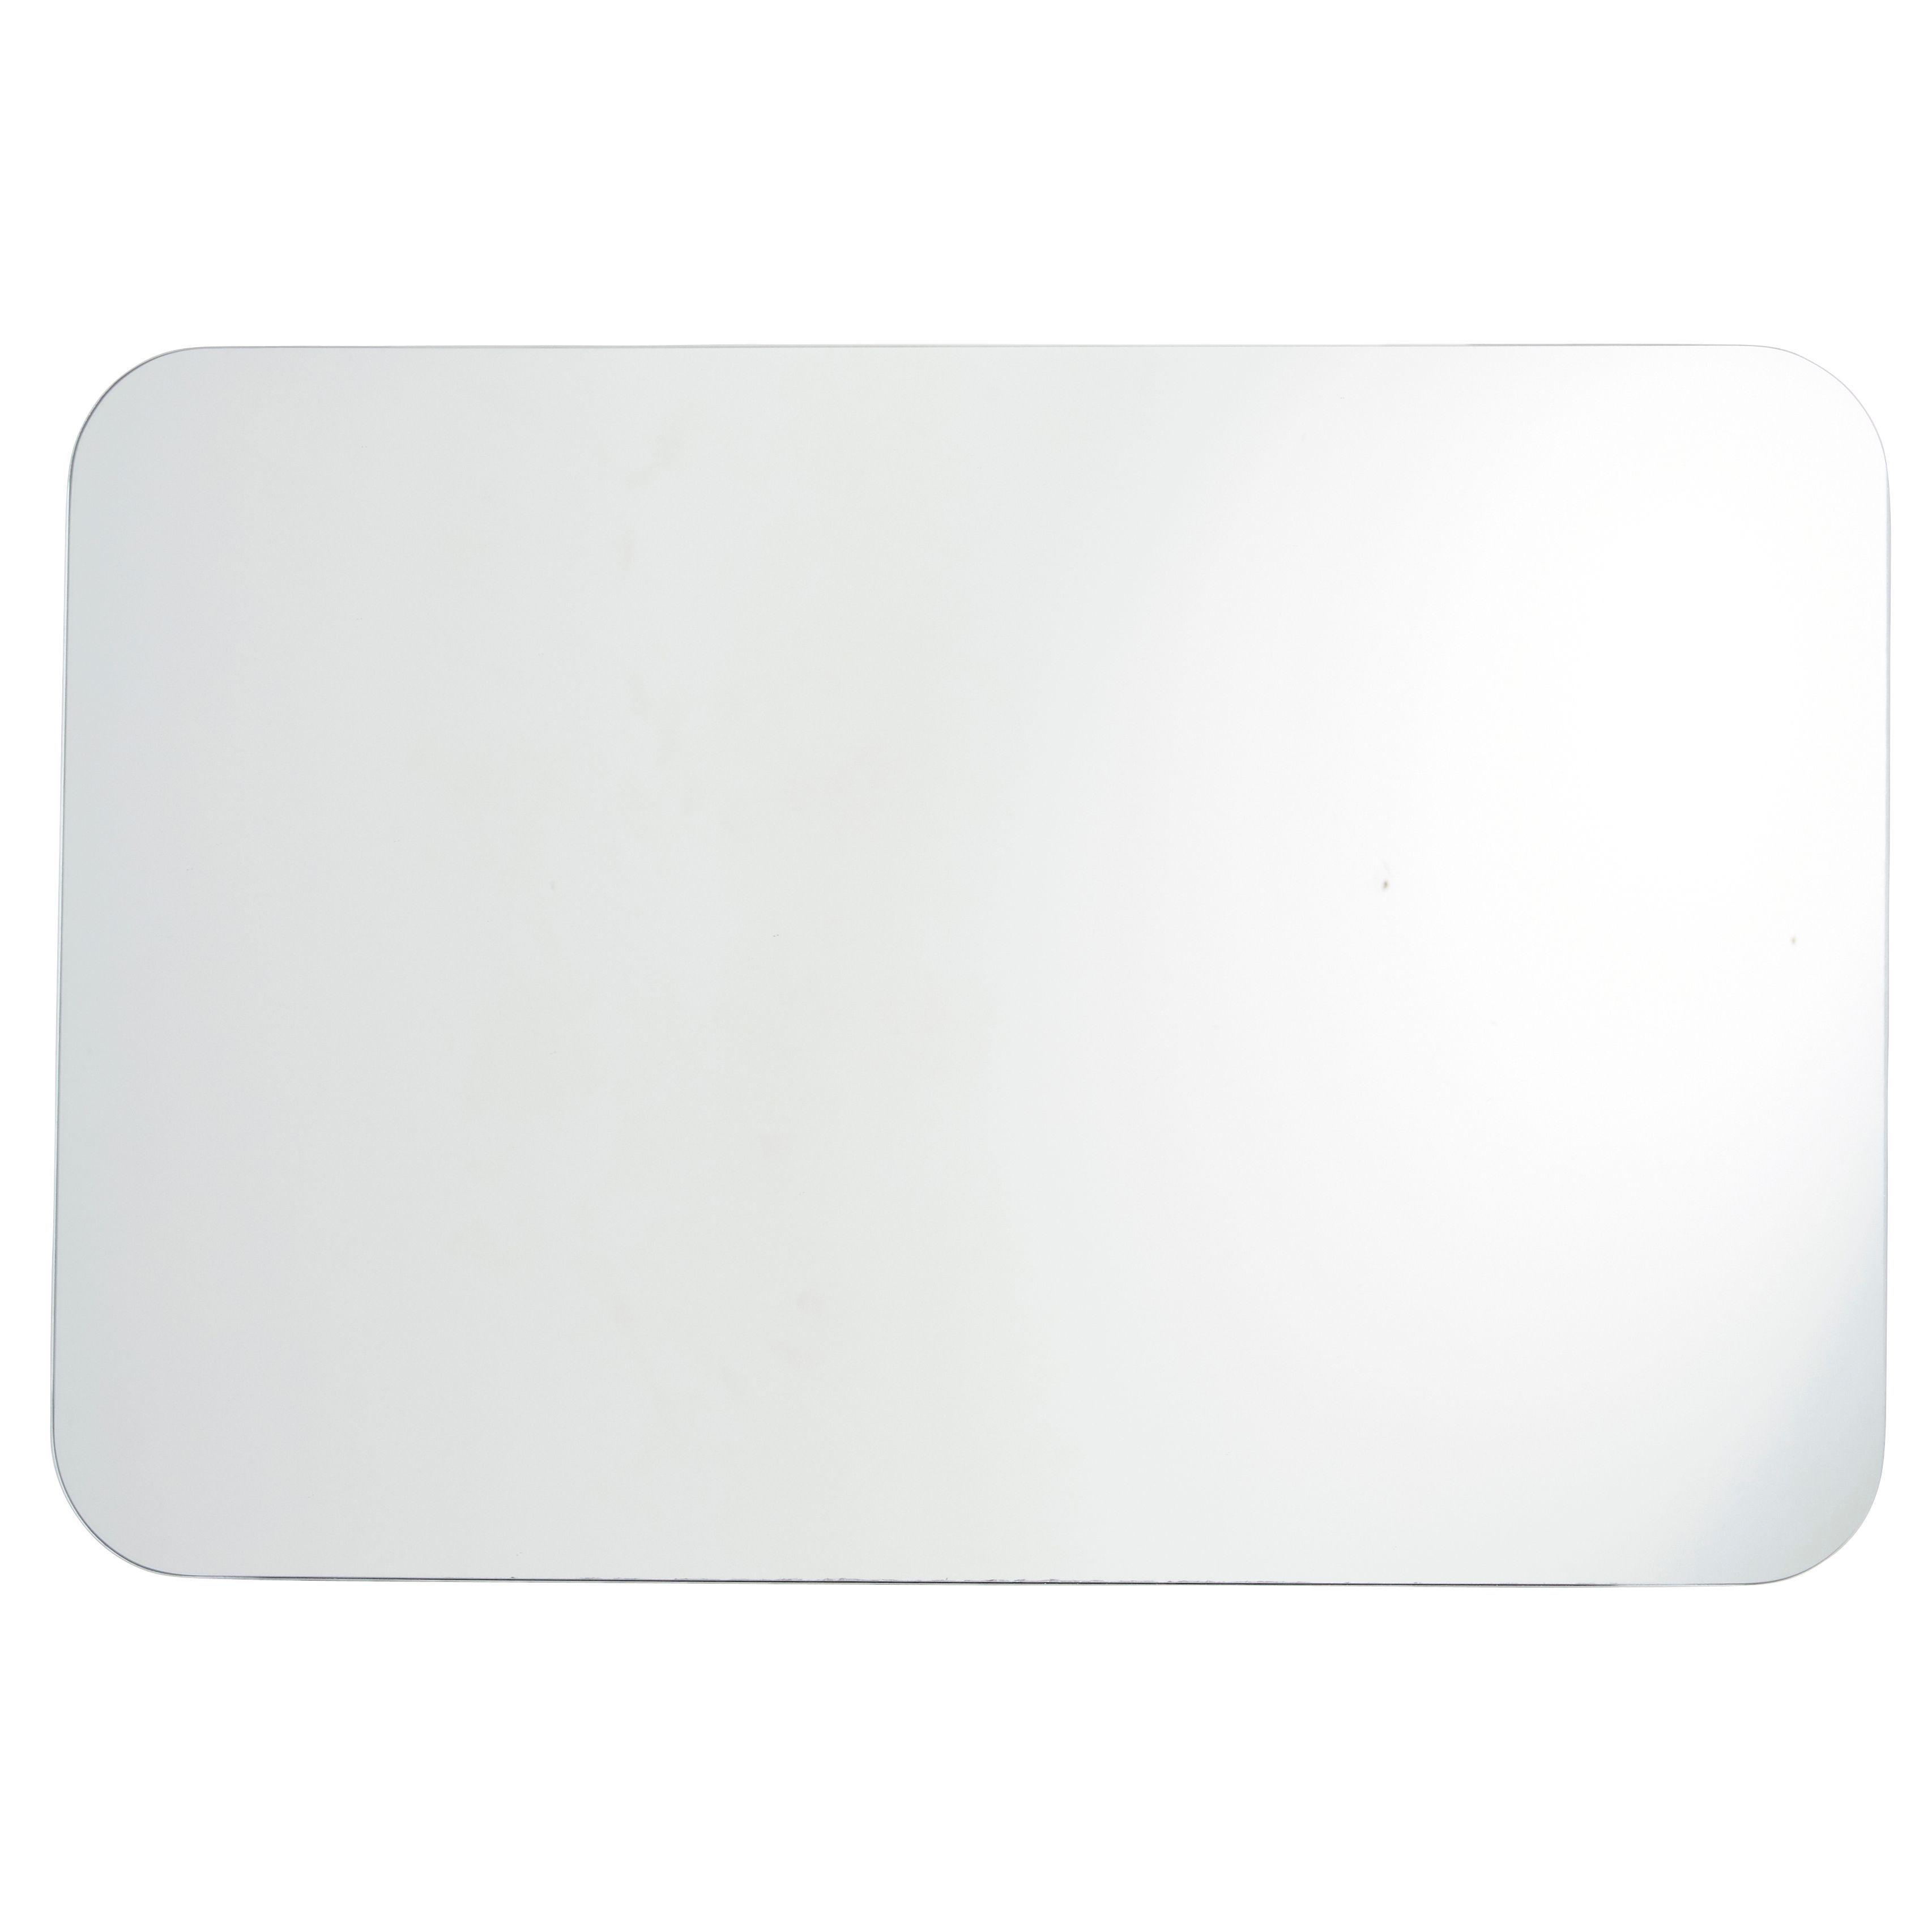 Cooke and lewis bathroom mirrors - Cooke Lewis Elbury Rectangular Mirror W 400mm H 600mm